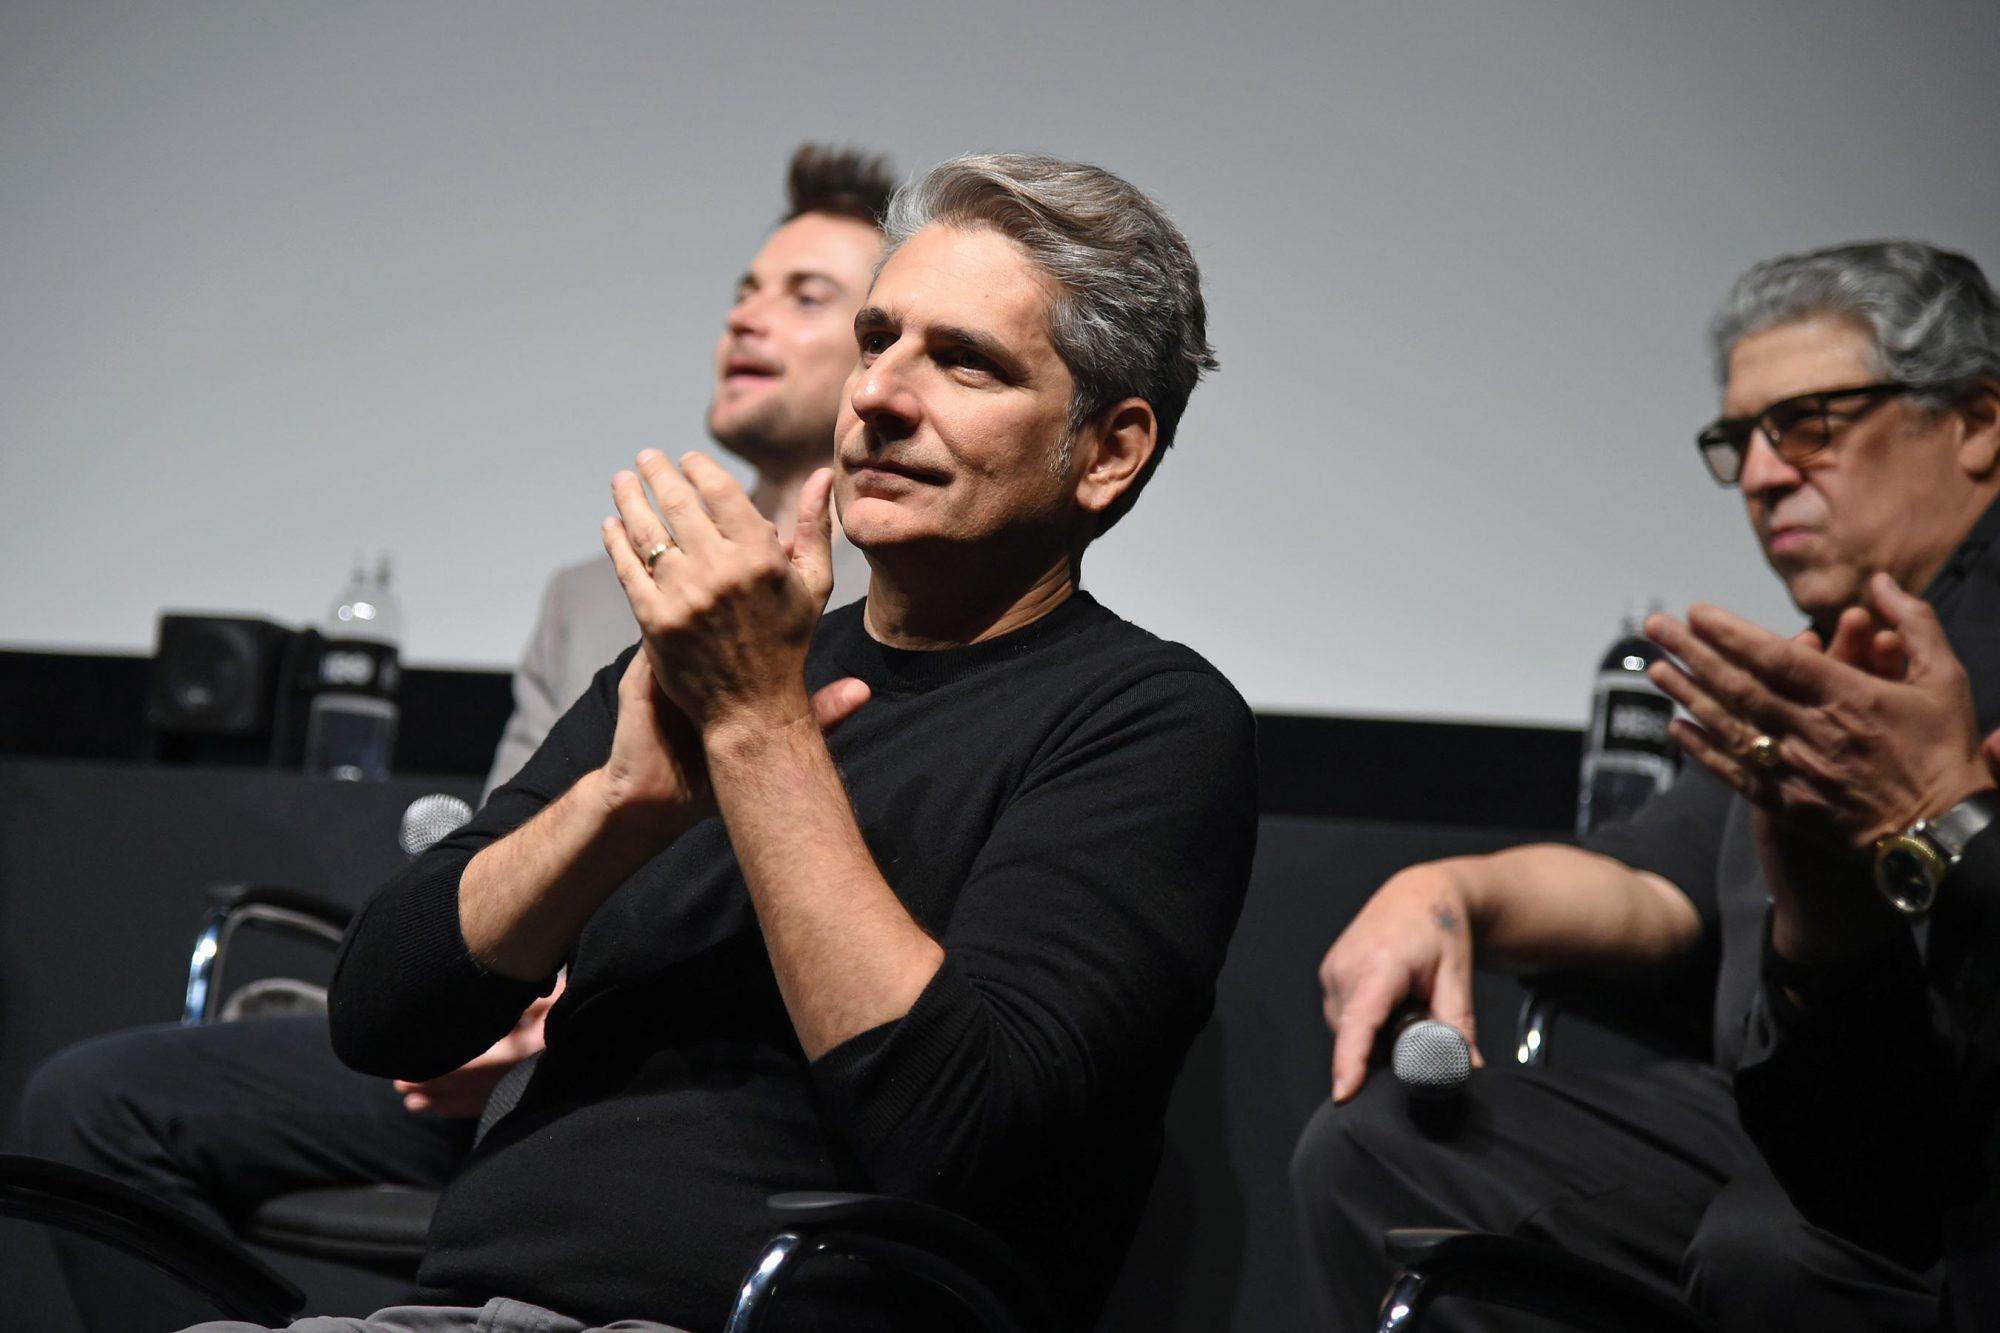 'Woke Up This Morning: The Sopranos 20th Anniversary Celebration', Panel, New York, USA - 09 Jan 2019